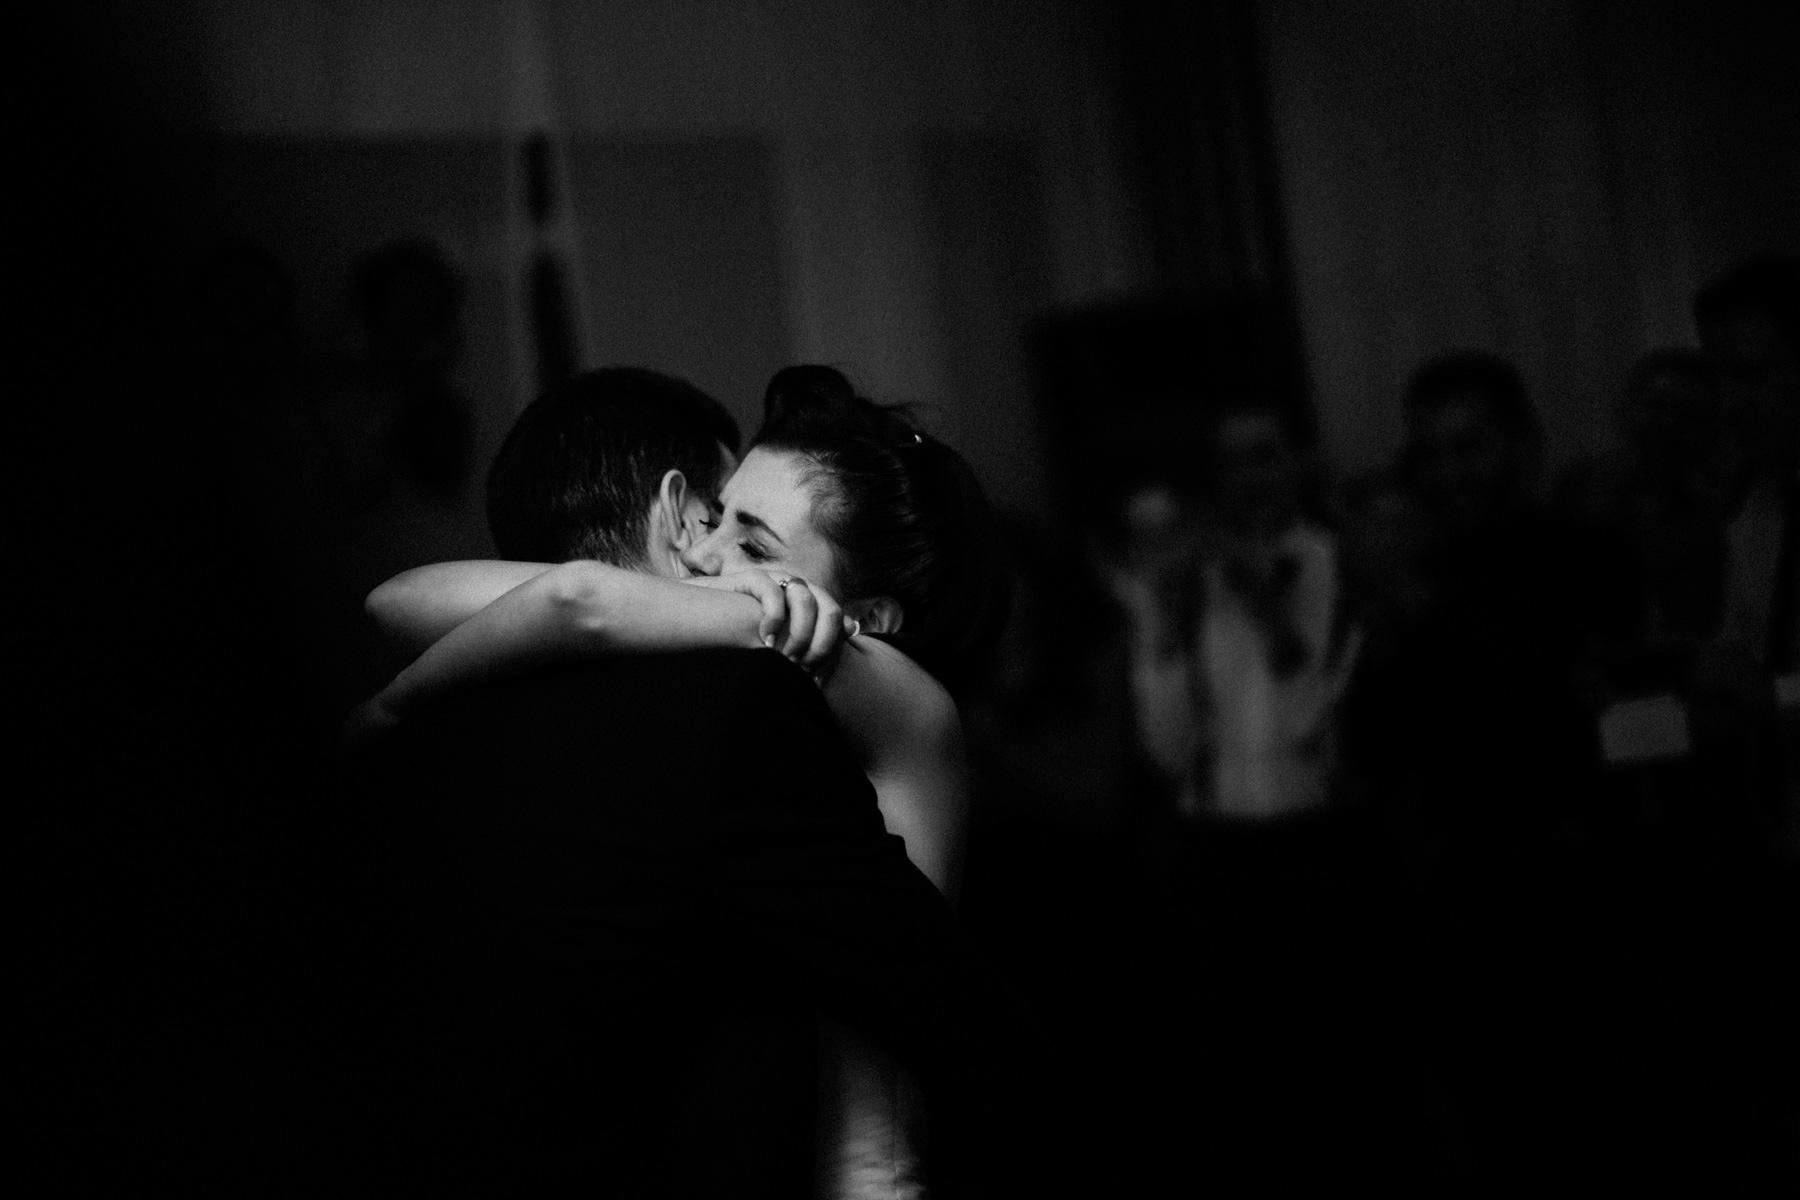 fotografo de bodas Jairo Crena-305